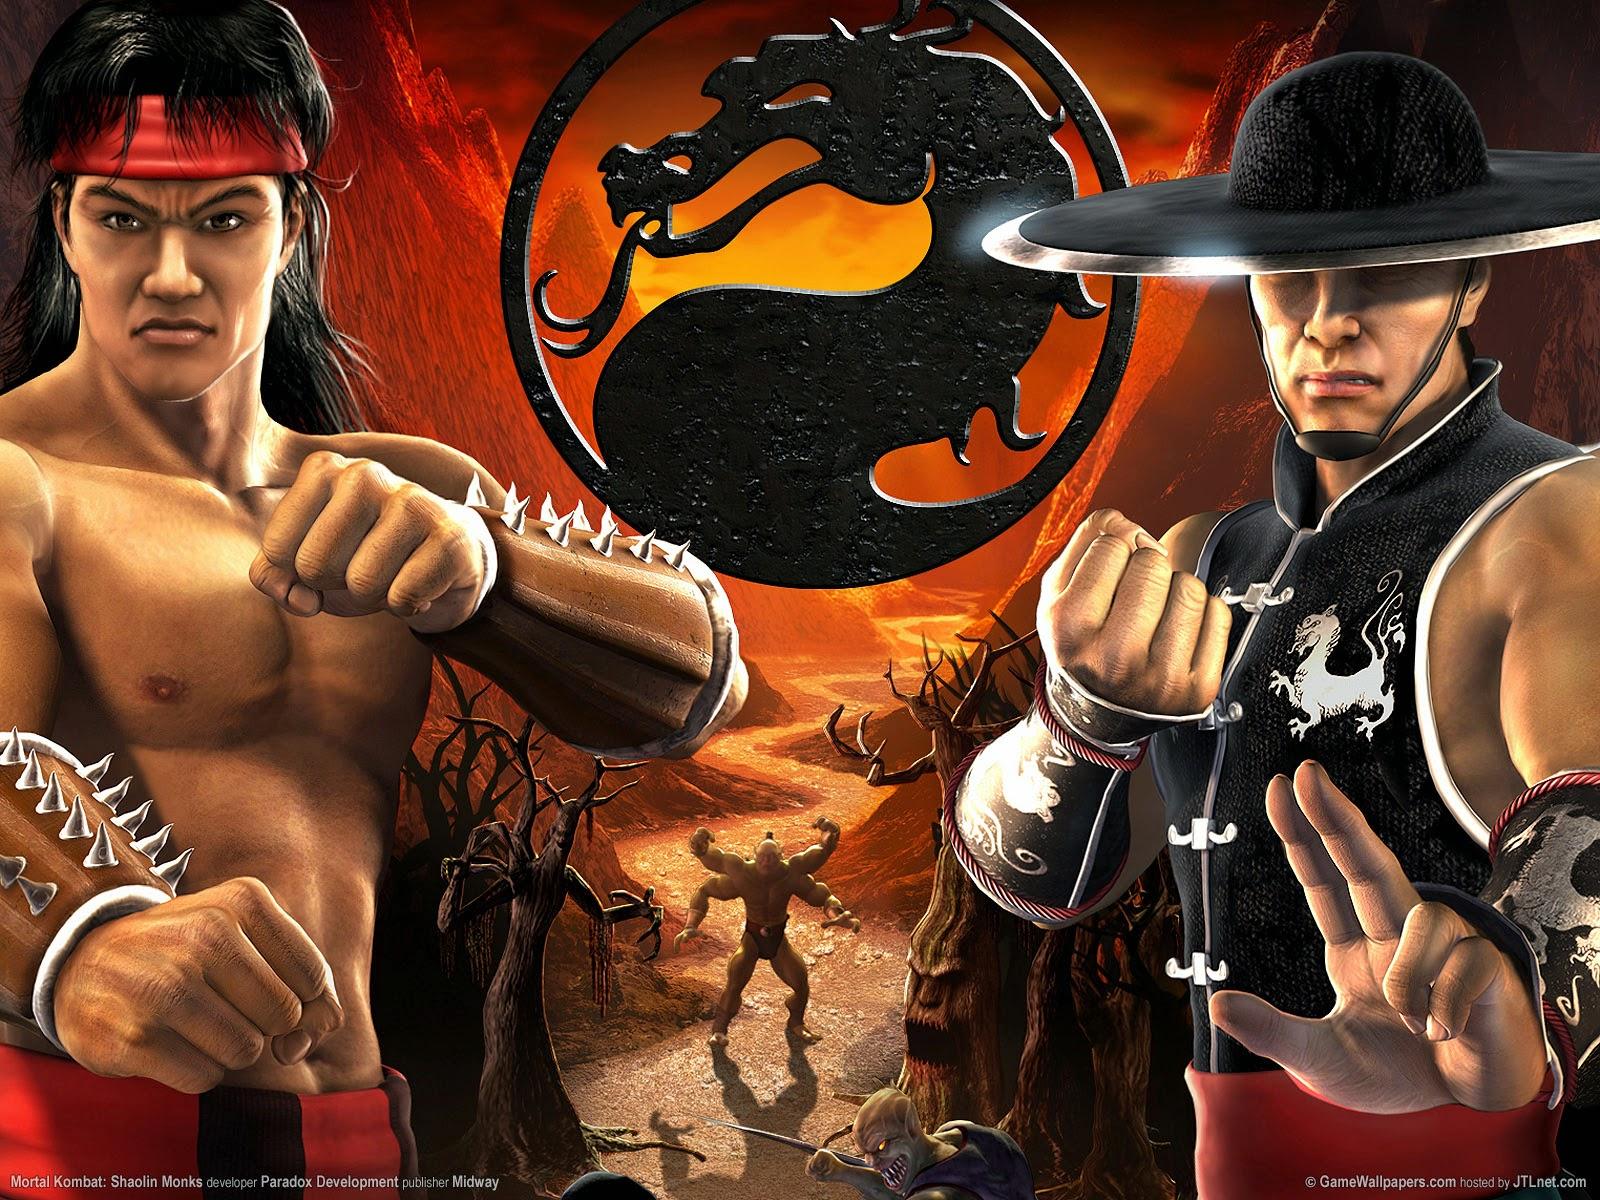 Password Mortal Kombat Armageddon and Shaolin Monks PS 2